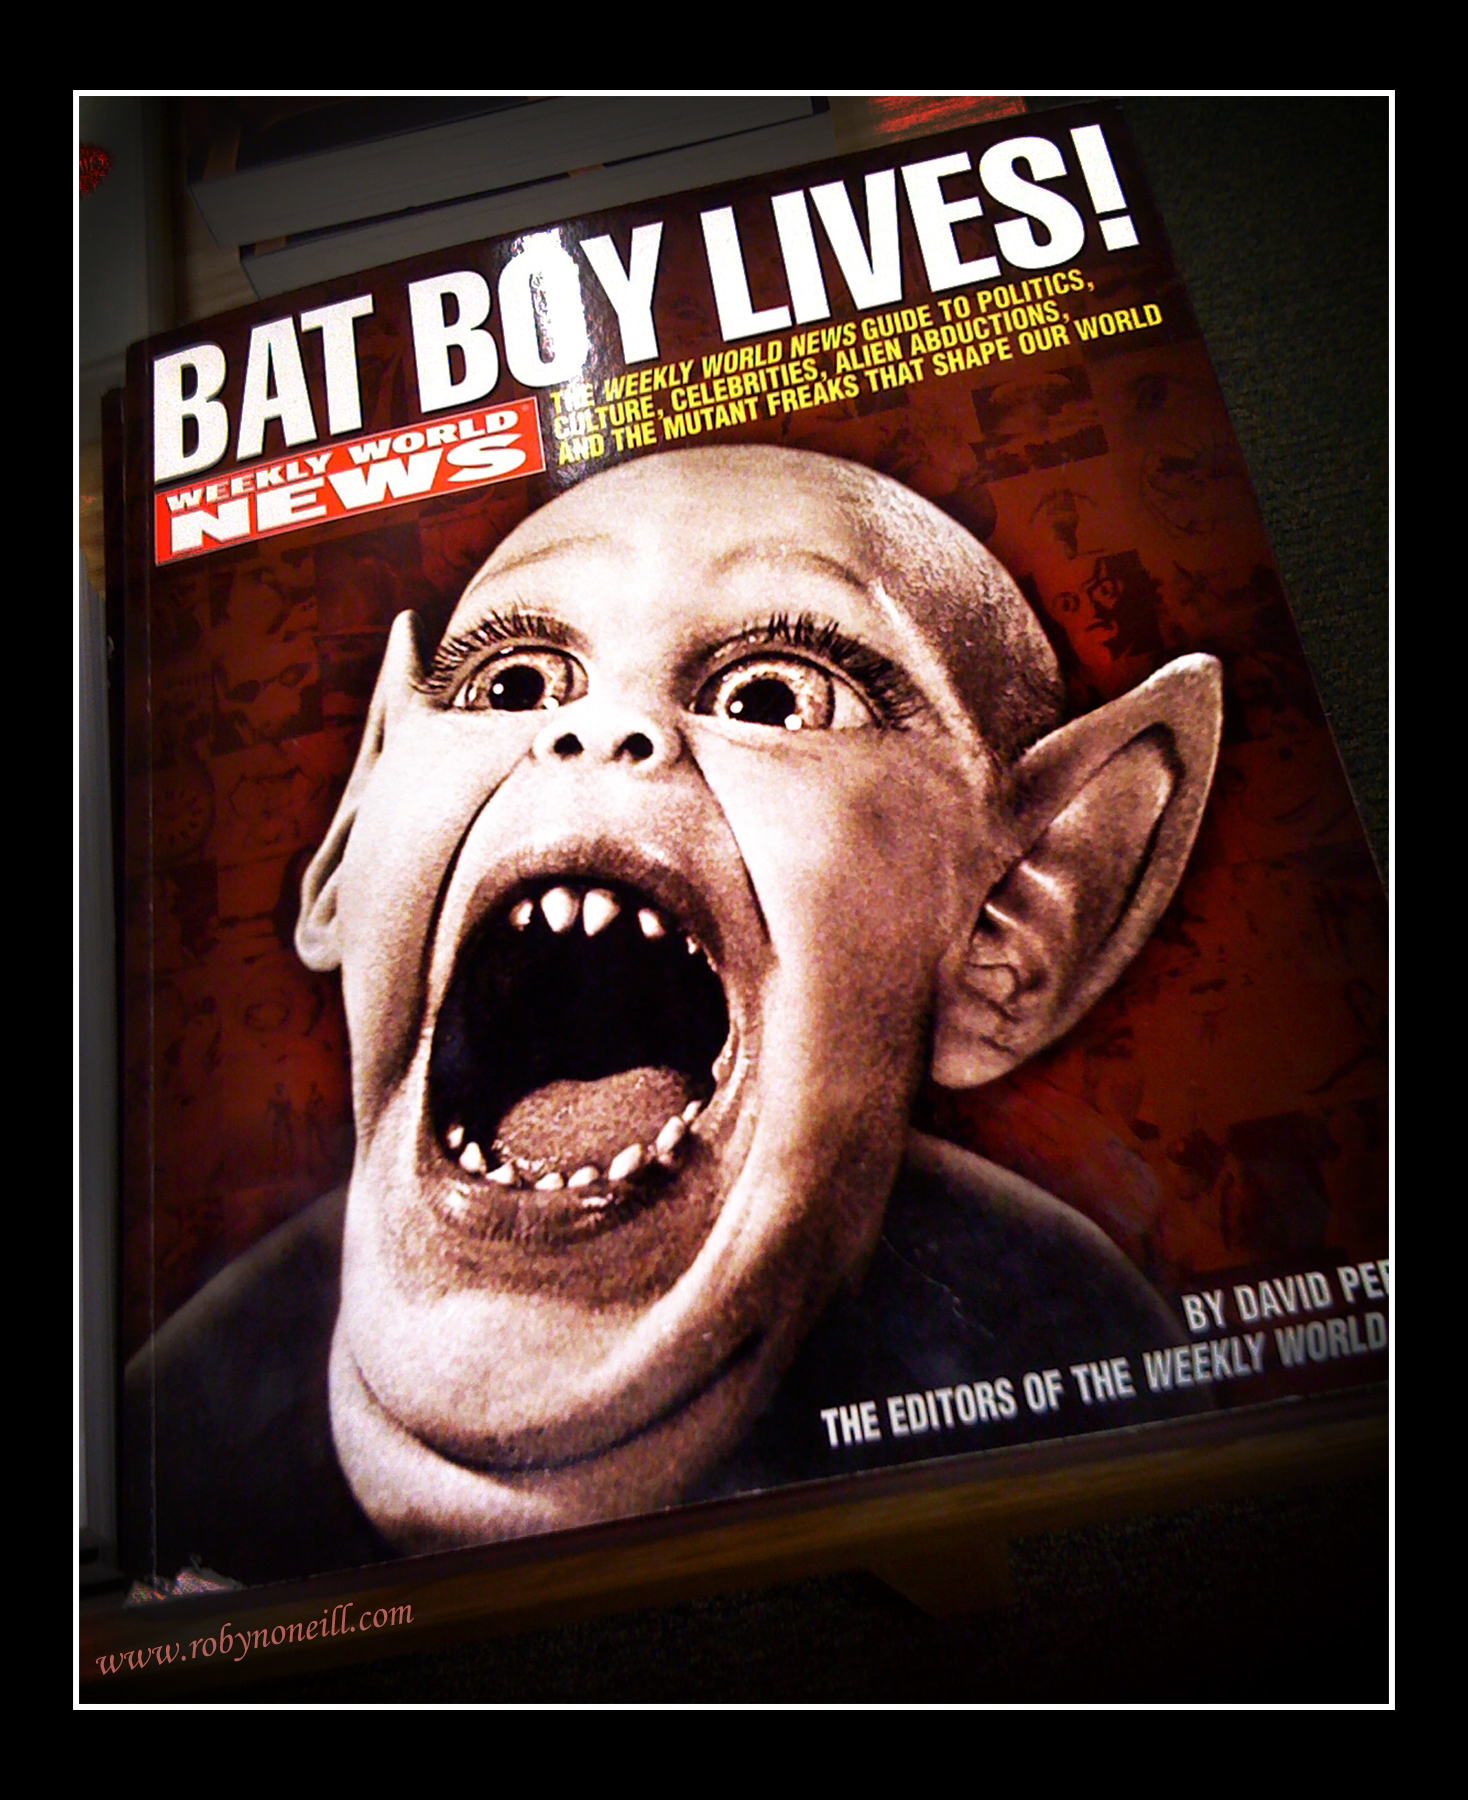 bat boy lives